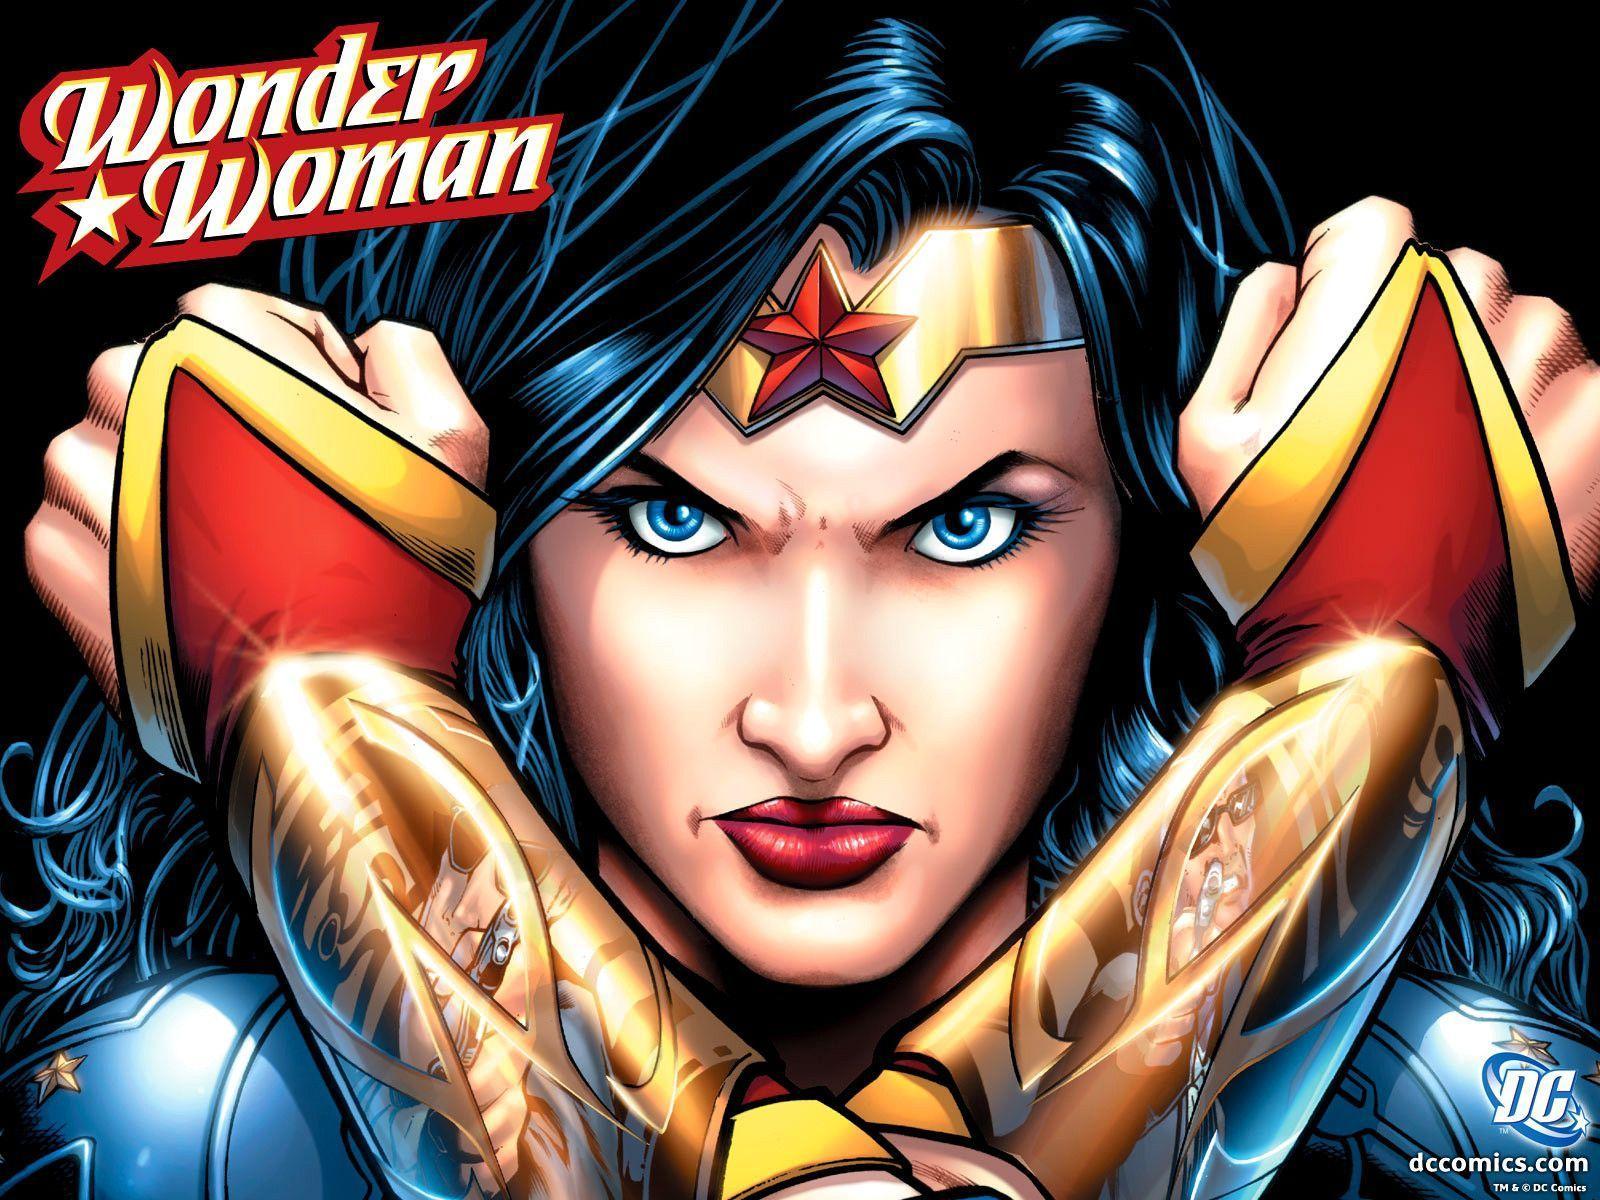 Wonderwoman Wallpaper 69 Images: Free Wonder Woman Wallpapers